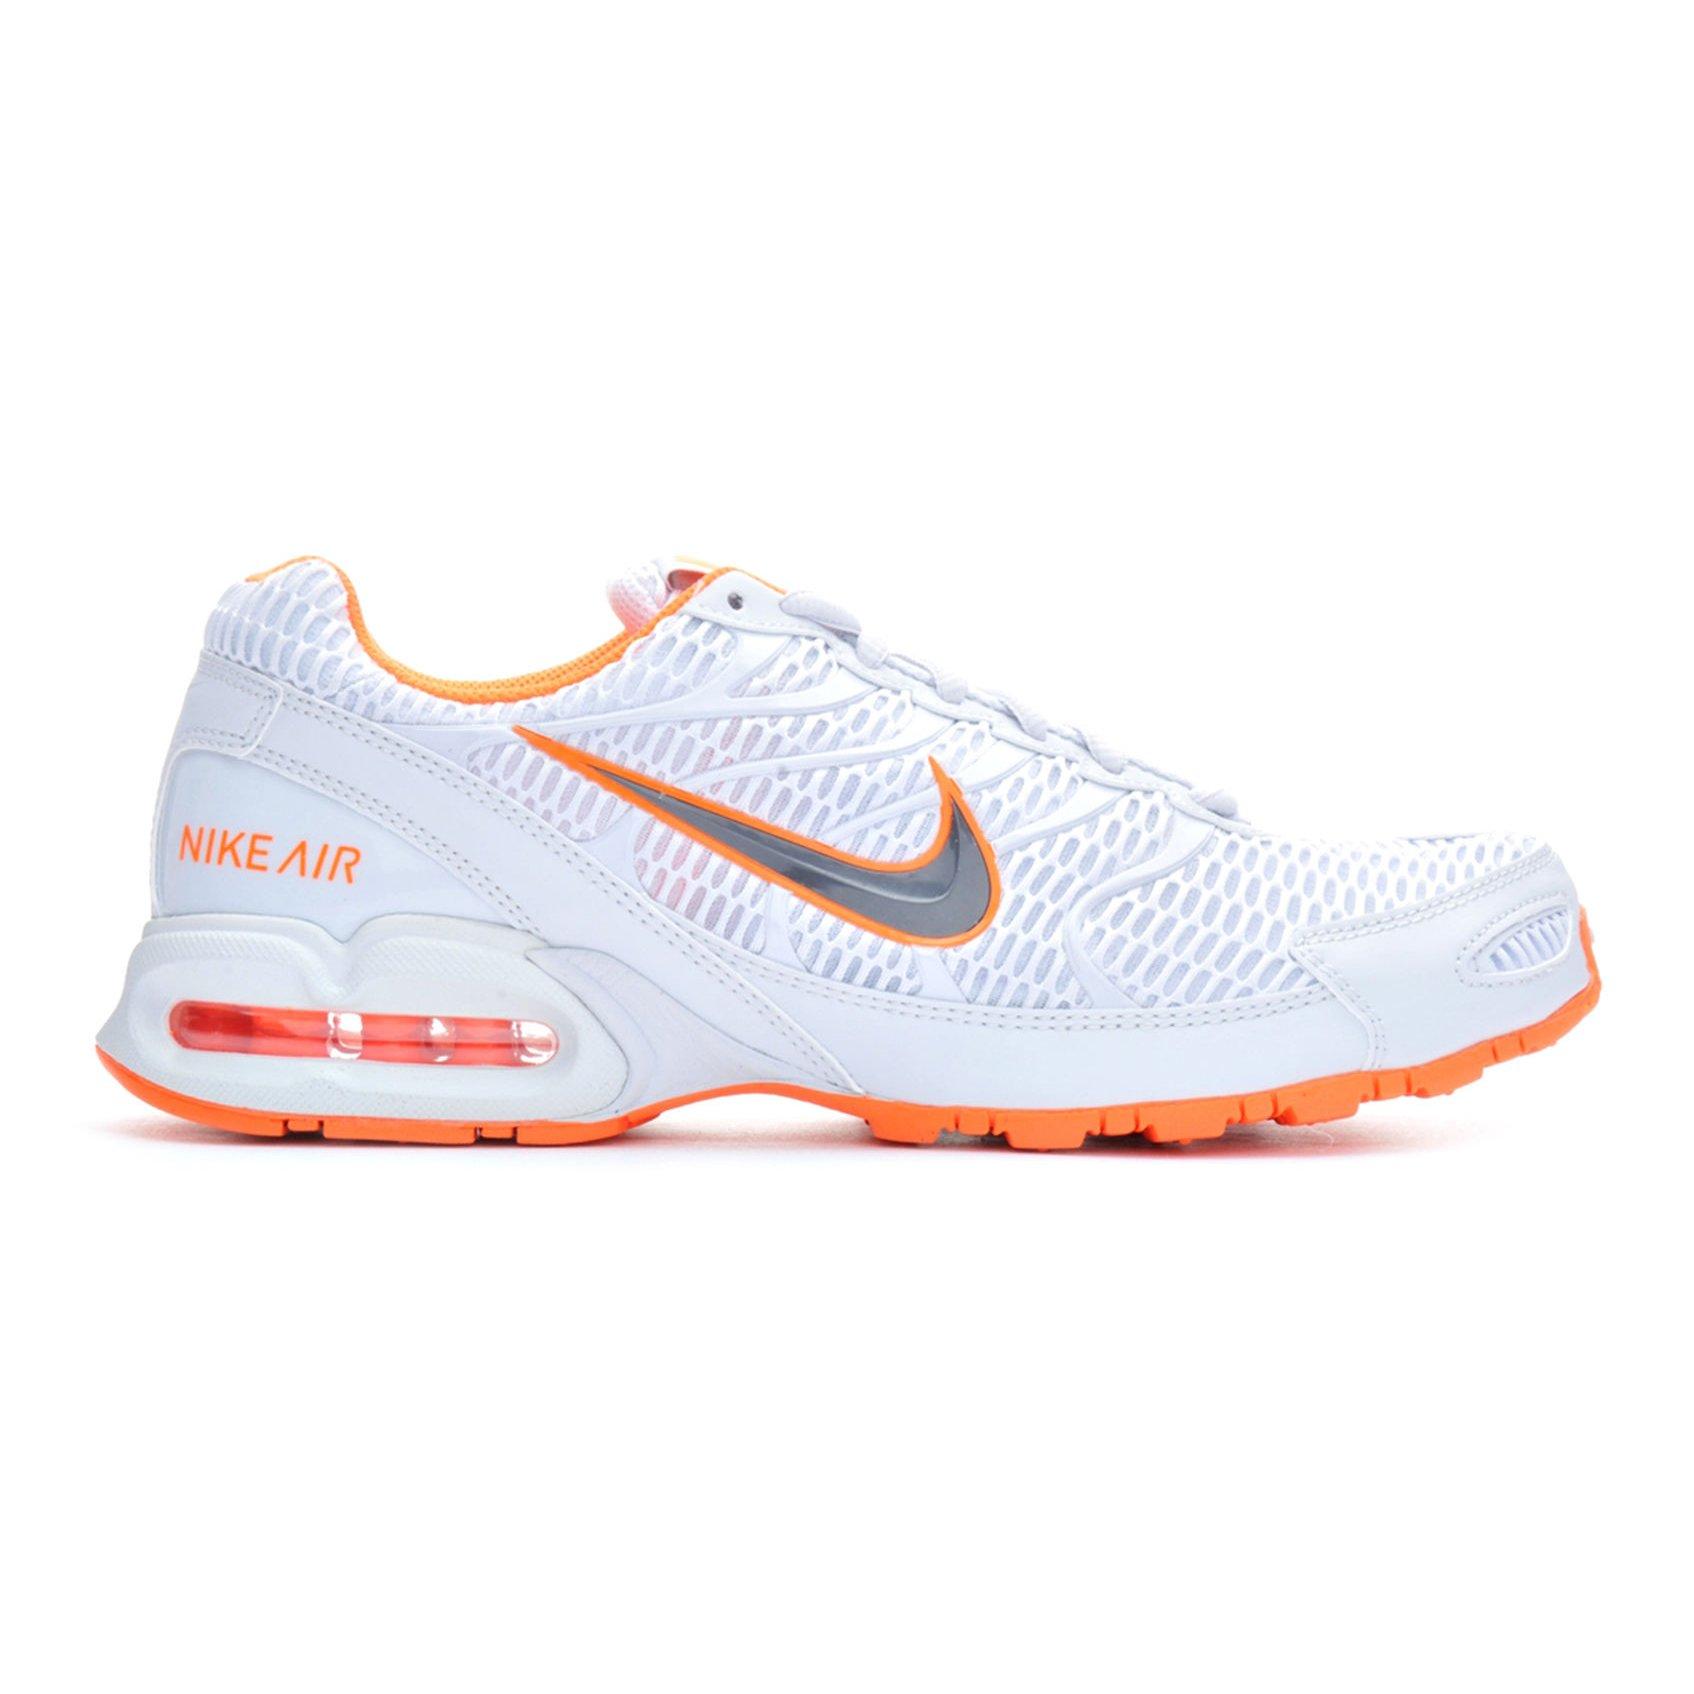 379b6e74456 Galleon - Nike Men s Air Max Torch 4 Running Shoes (12 D(M) US